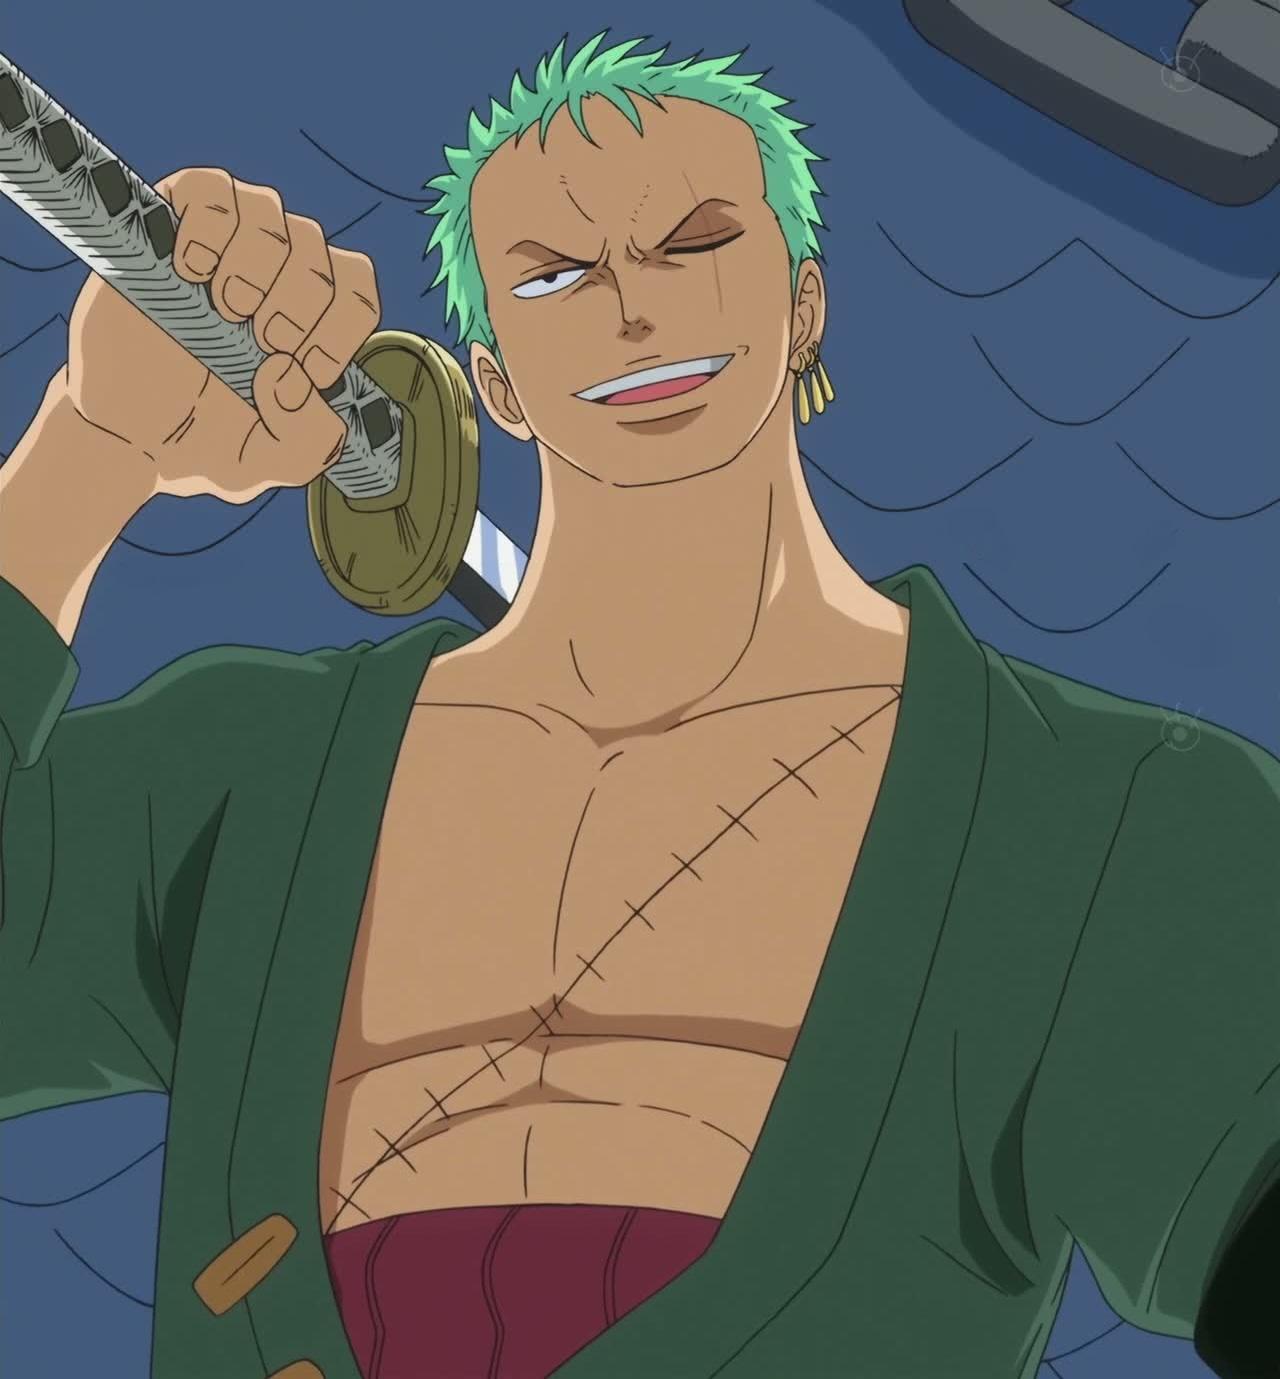 Roronoa Zoro - ONE PIECE - Image #1025769 - Zerochan Anime ...